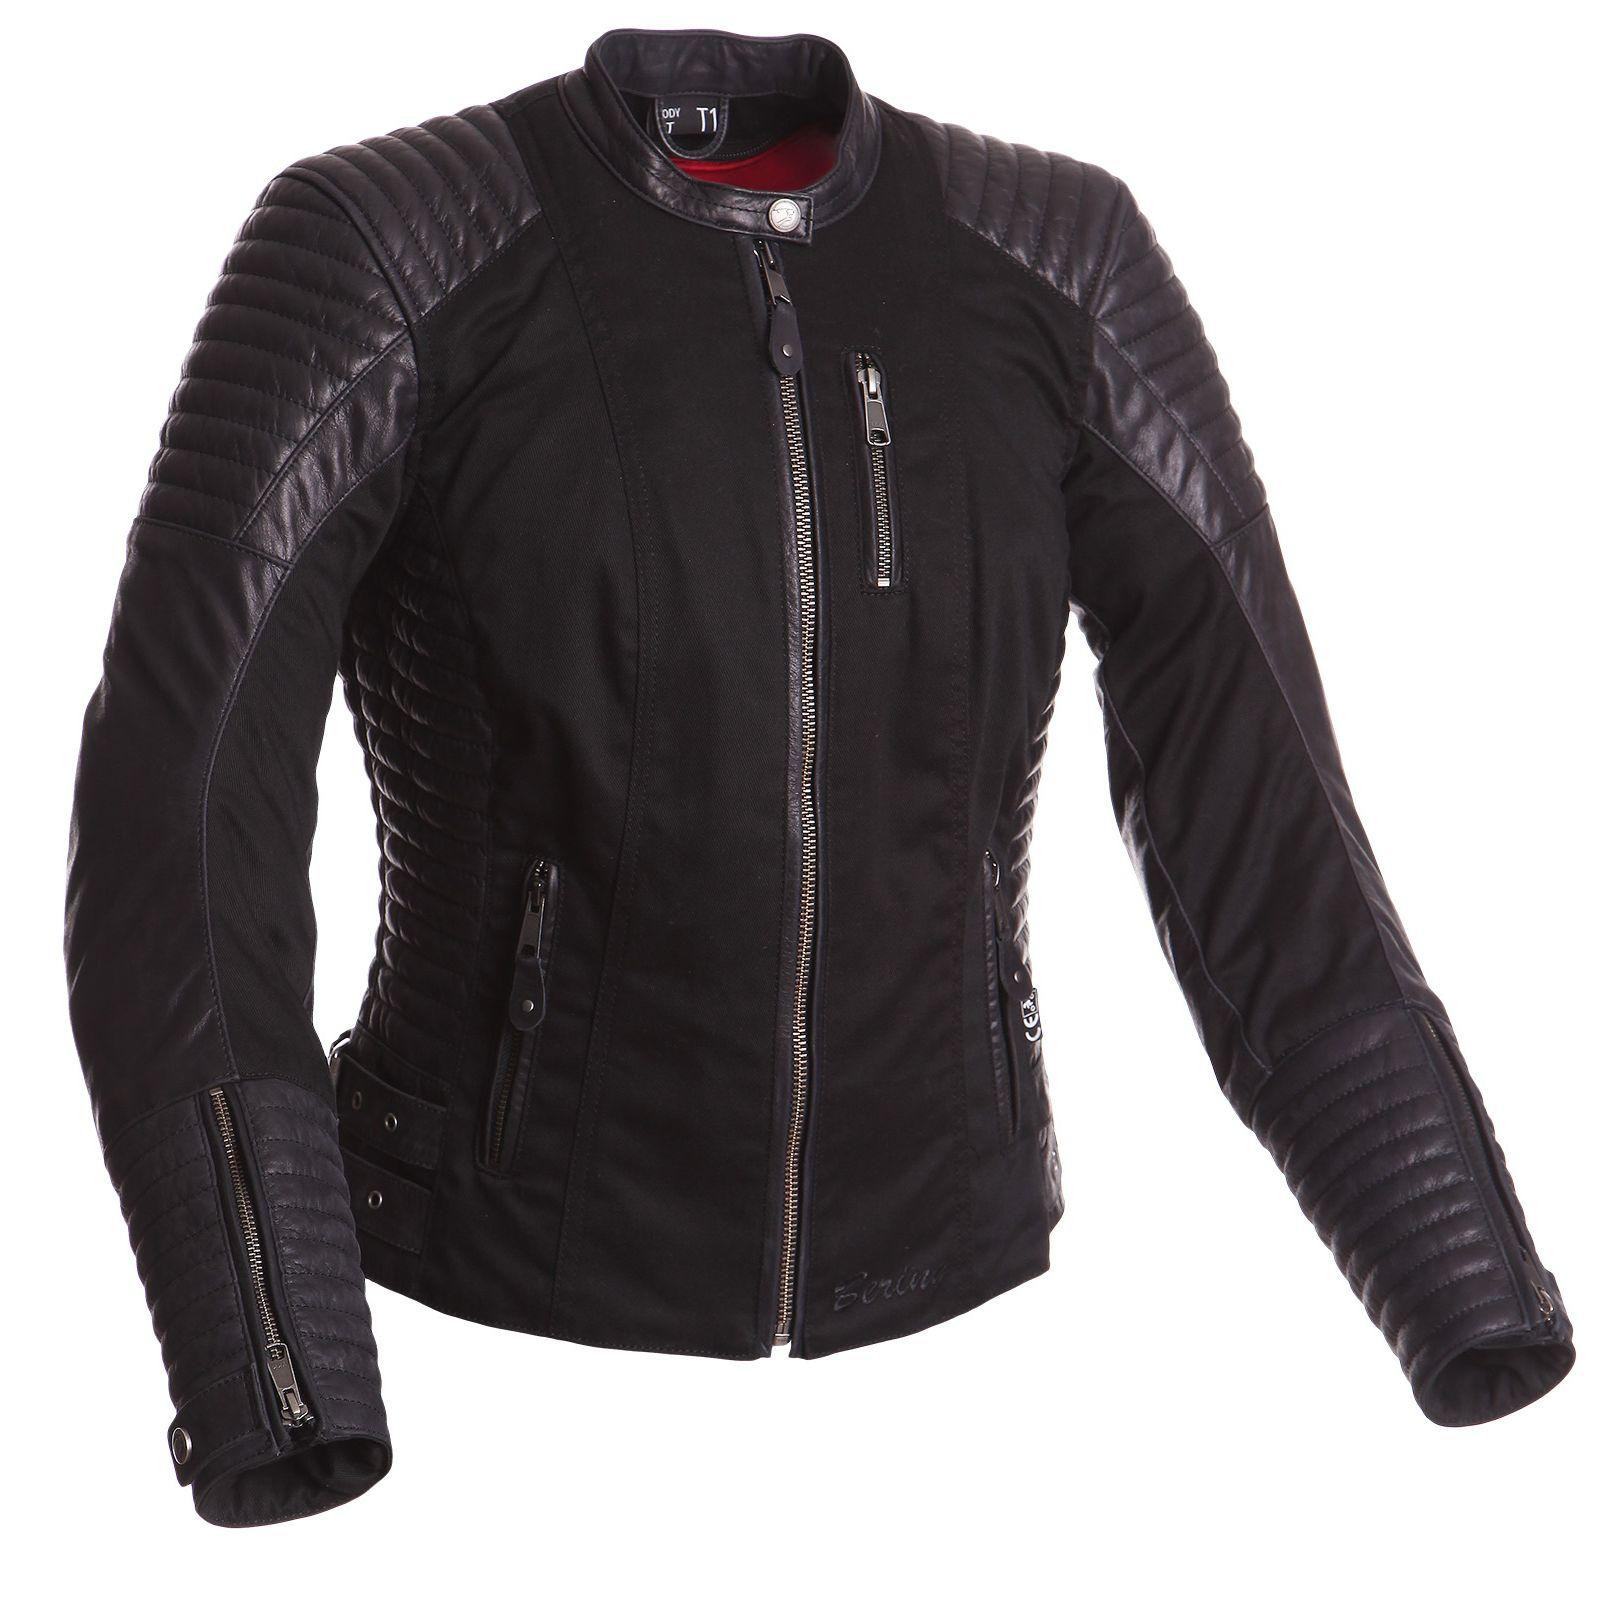 Giubbotto Bering LADY ROSITA - Giubbotti e giacche c643057b44d